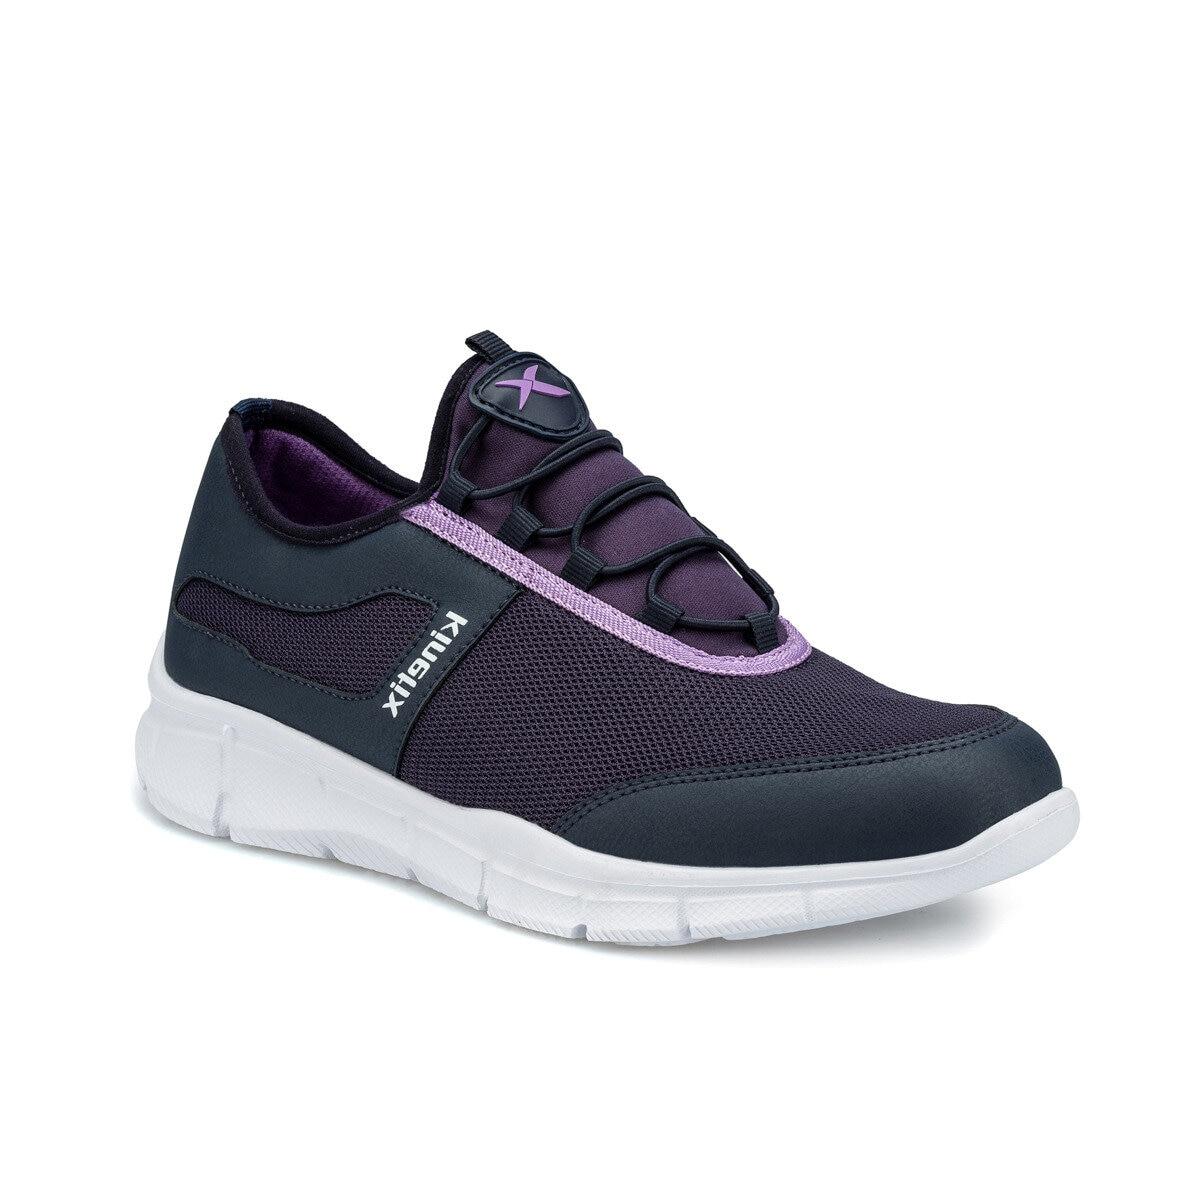 FLO AIRSHIP W Navy Blue Women 'S Comfort Shoes KINETIX